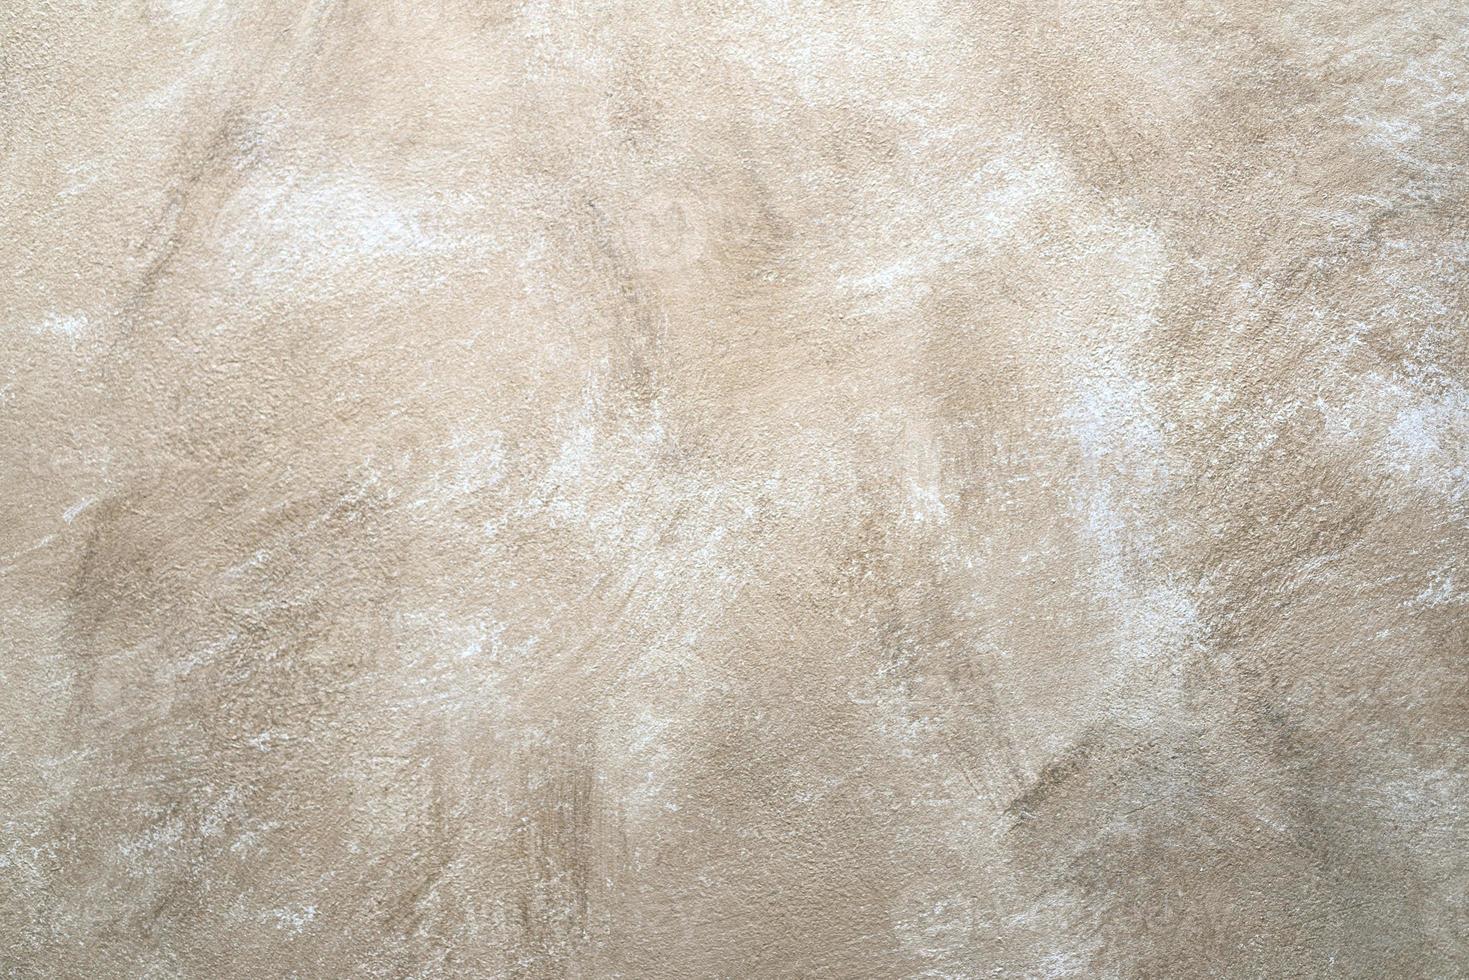 fond de mur beige abstrait rock photo